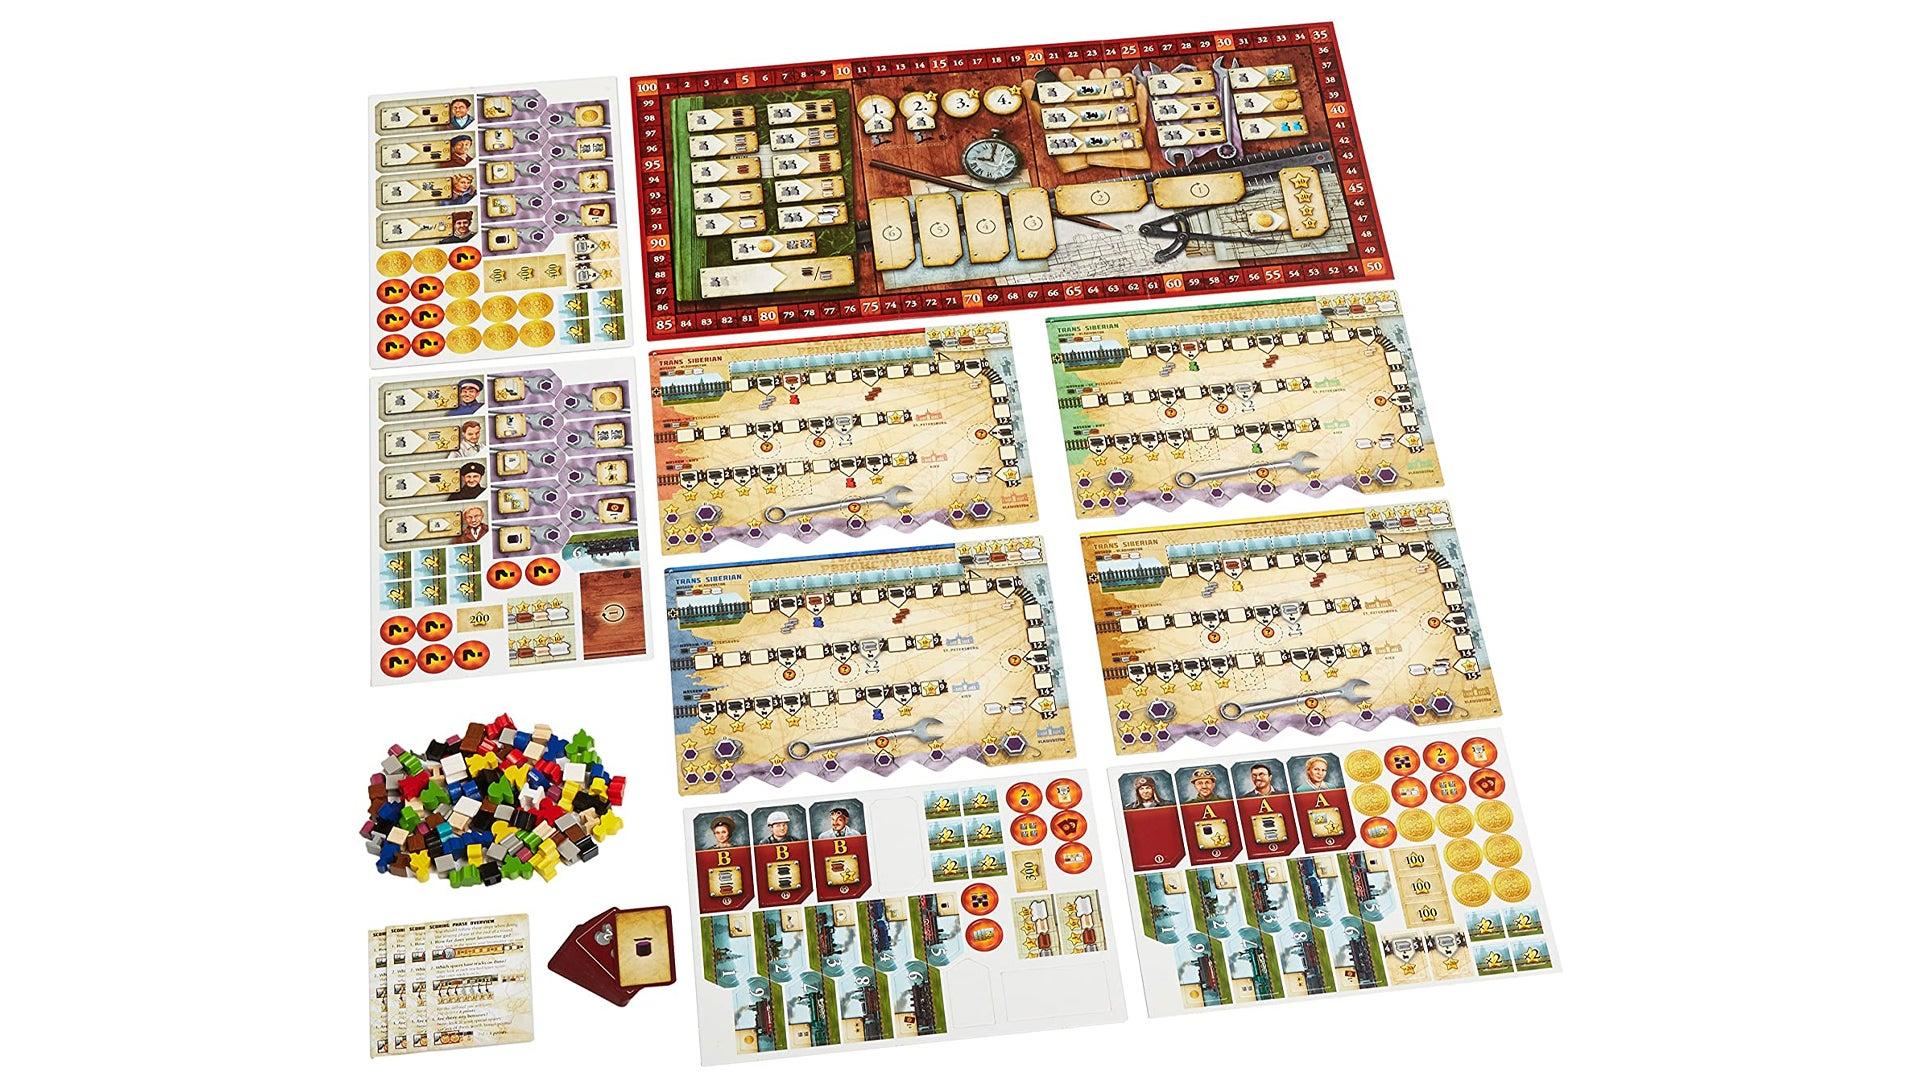 Russian Railroads board game layout